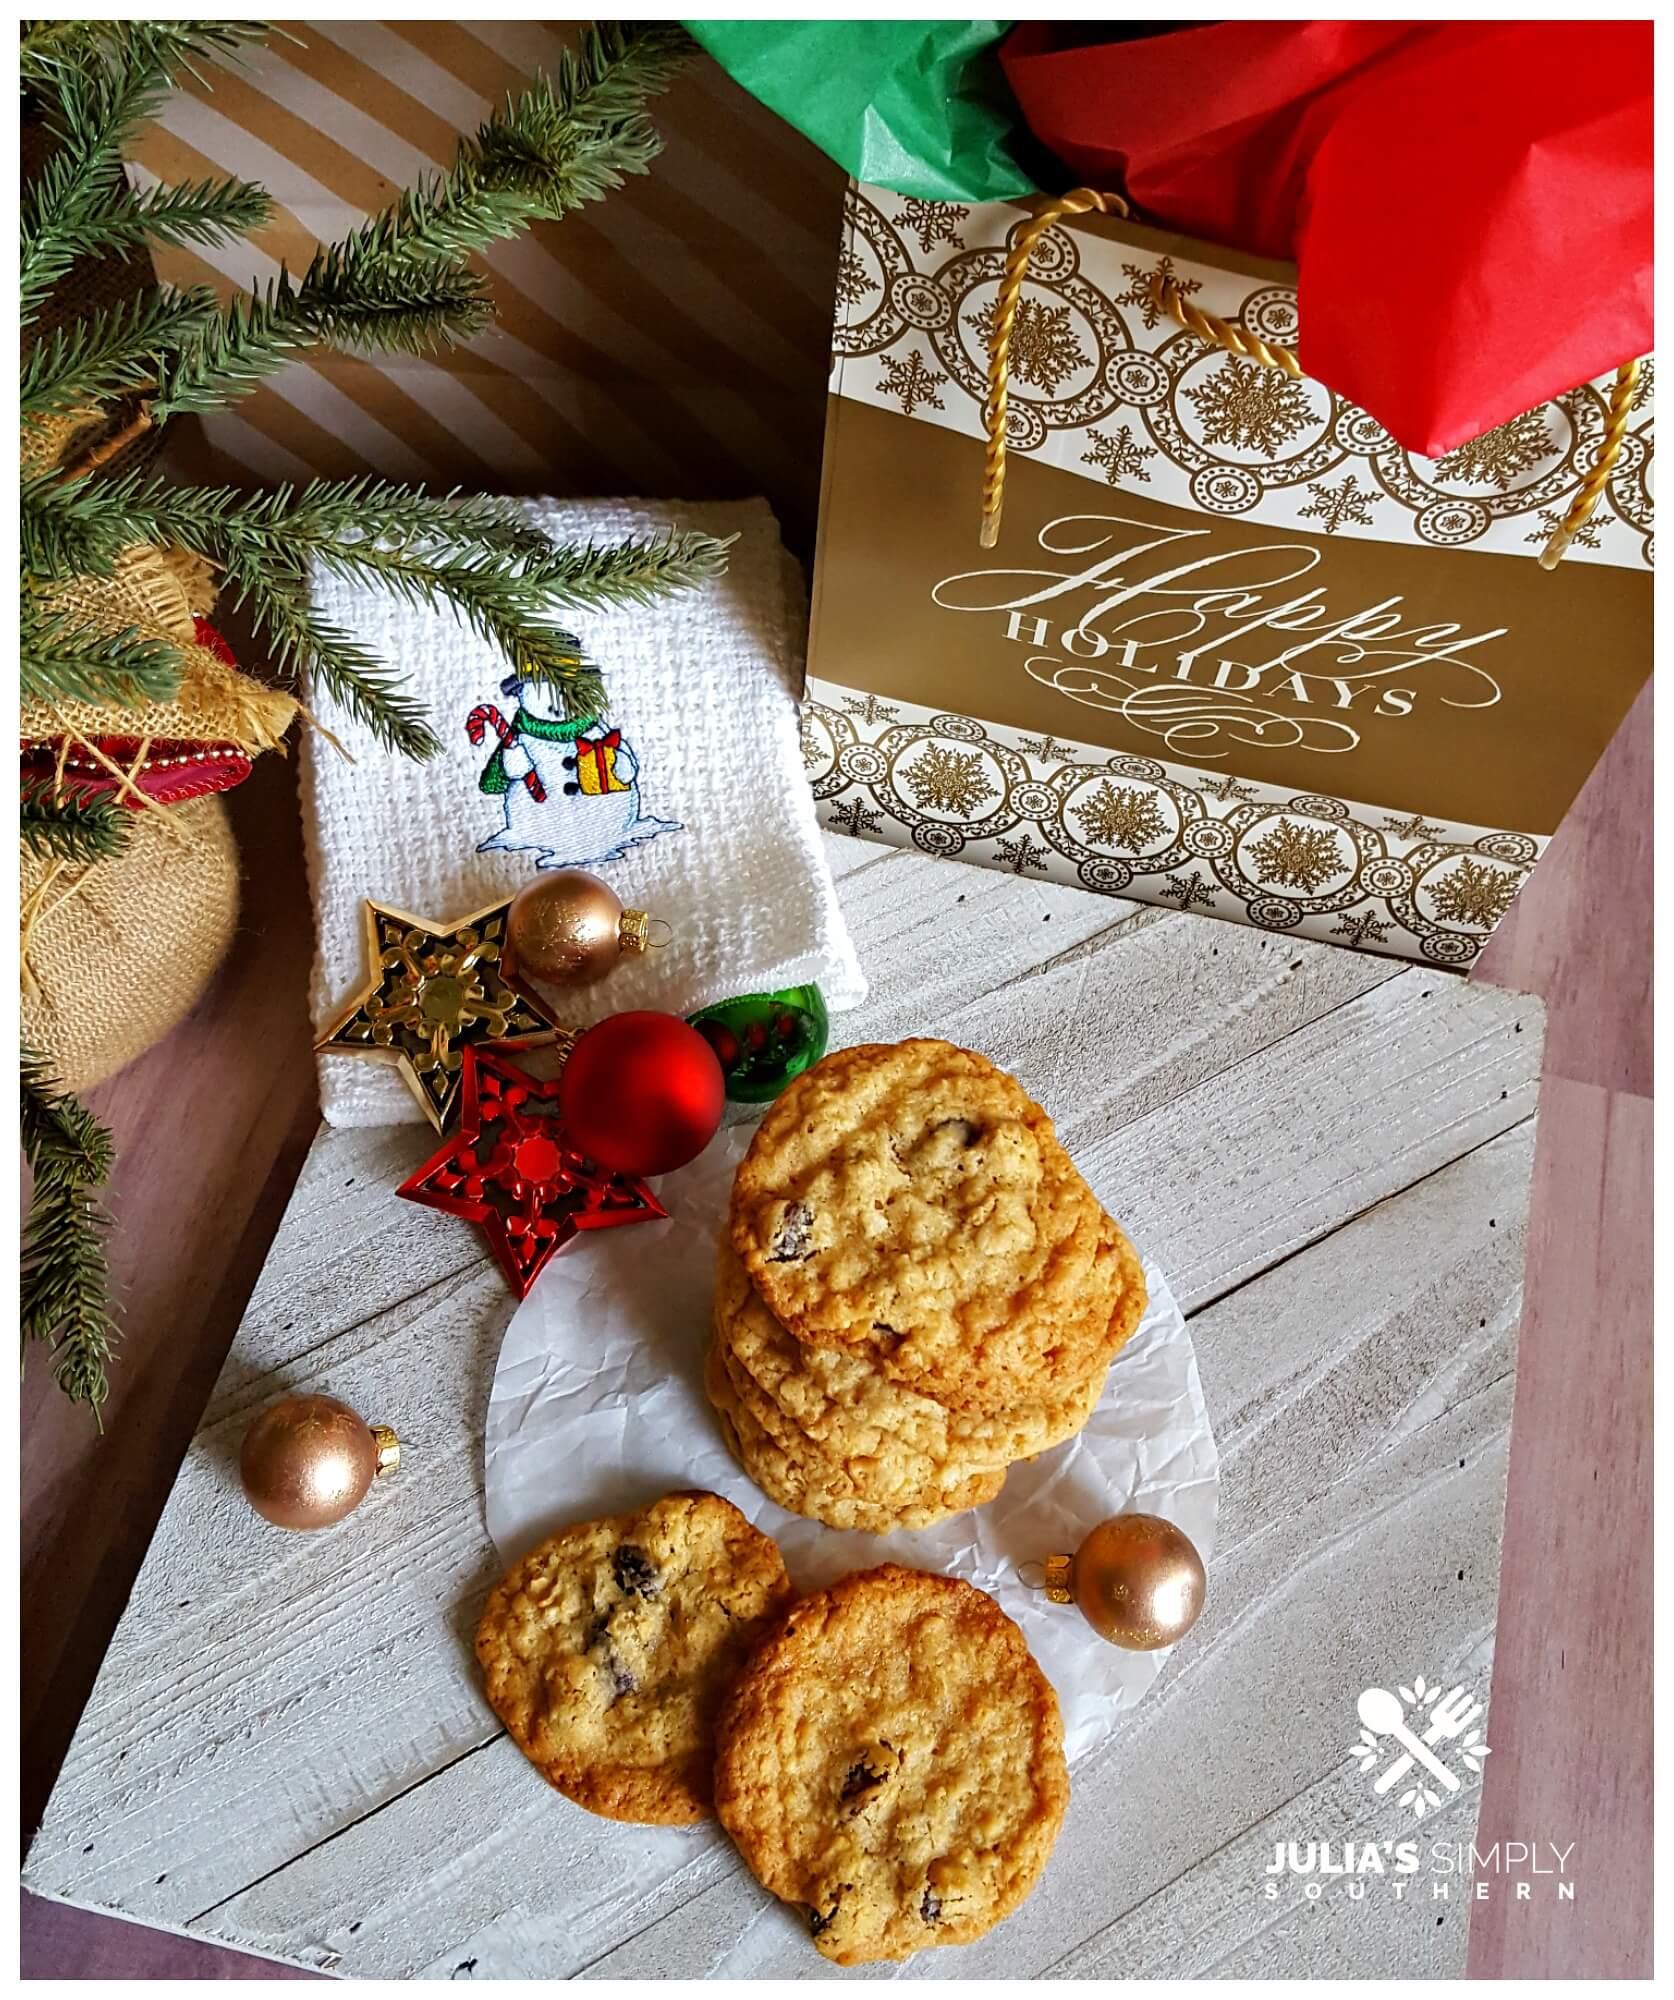 Best Christmas Cookies - Ultimate Oatmeal Raisin